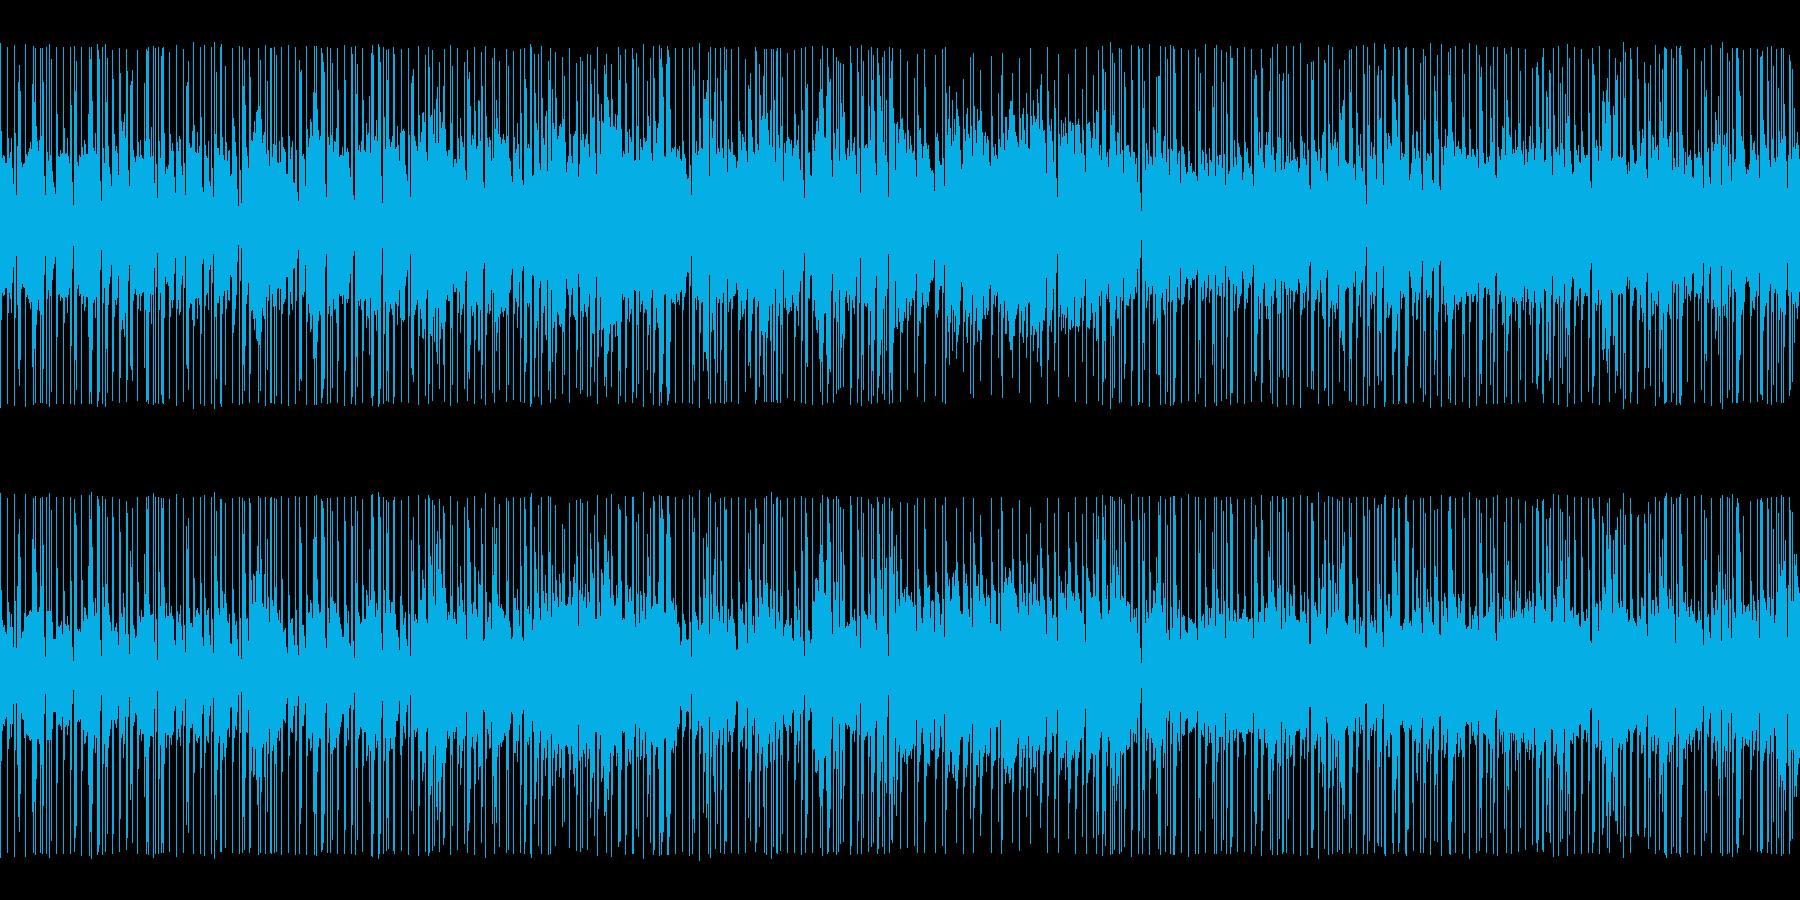 BGM012-01 商品紹介、会社紹介…の再生済みの波形